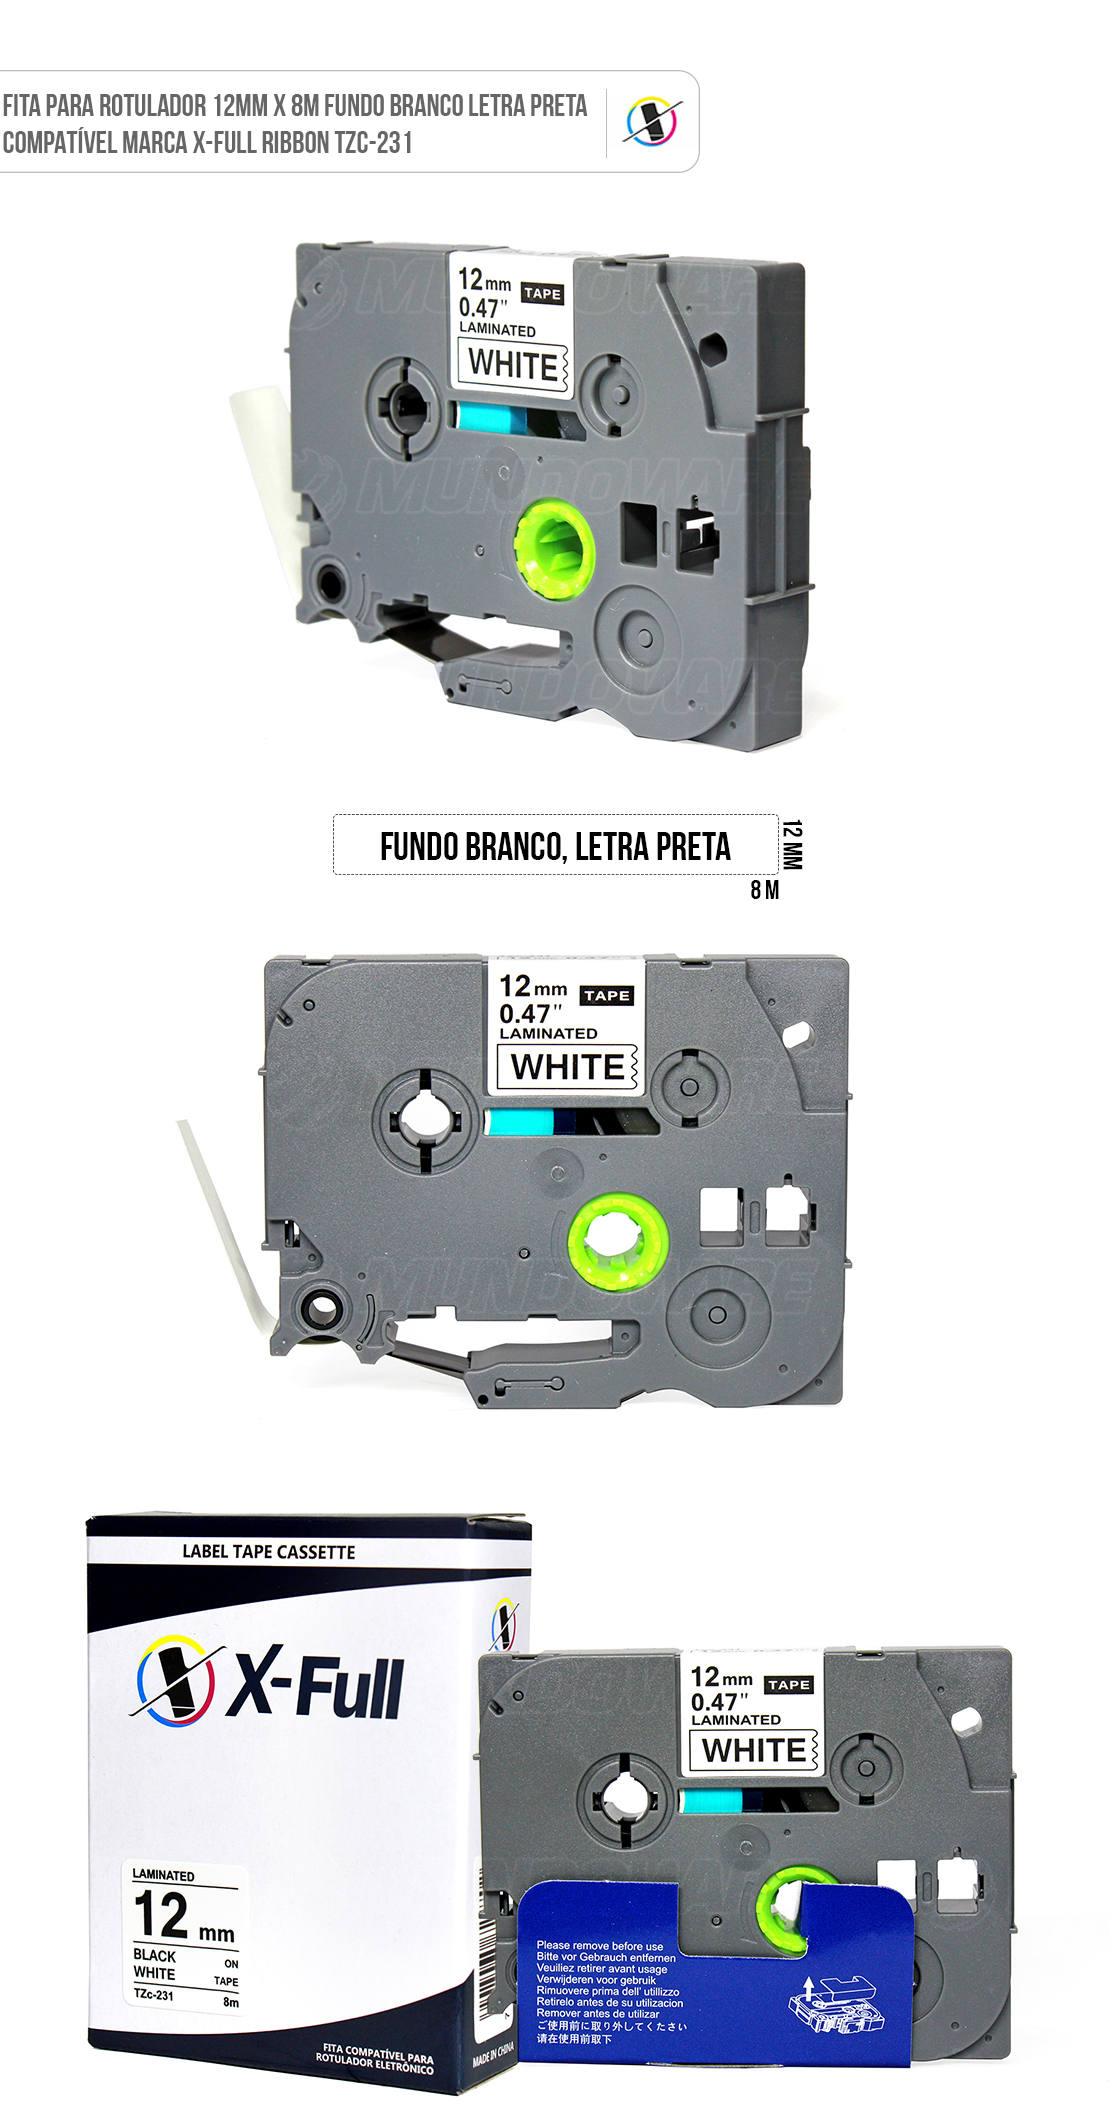 Fita Compatível para Rotulador Marca X-Full Referência TZc-231 TZe-231 TZ-231 12mm x 8m Branco/Preto para Brother